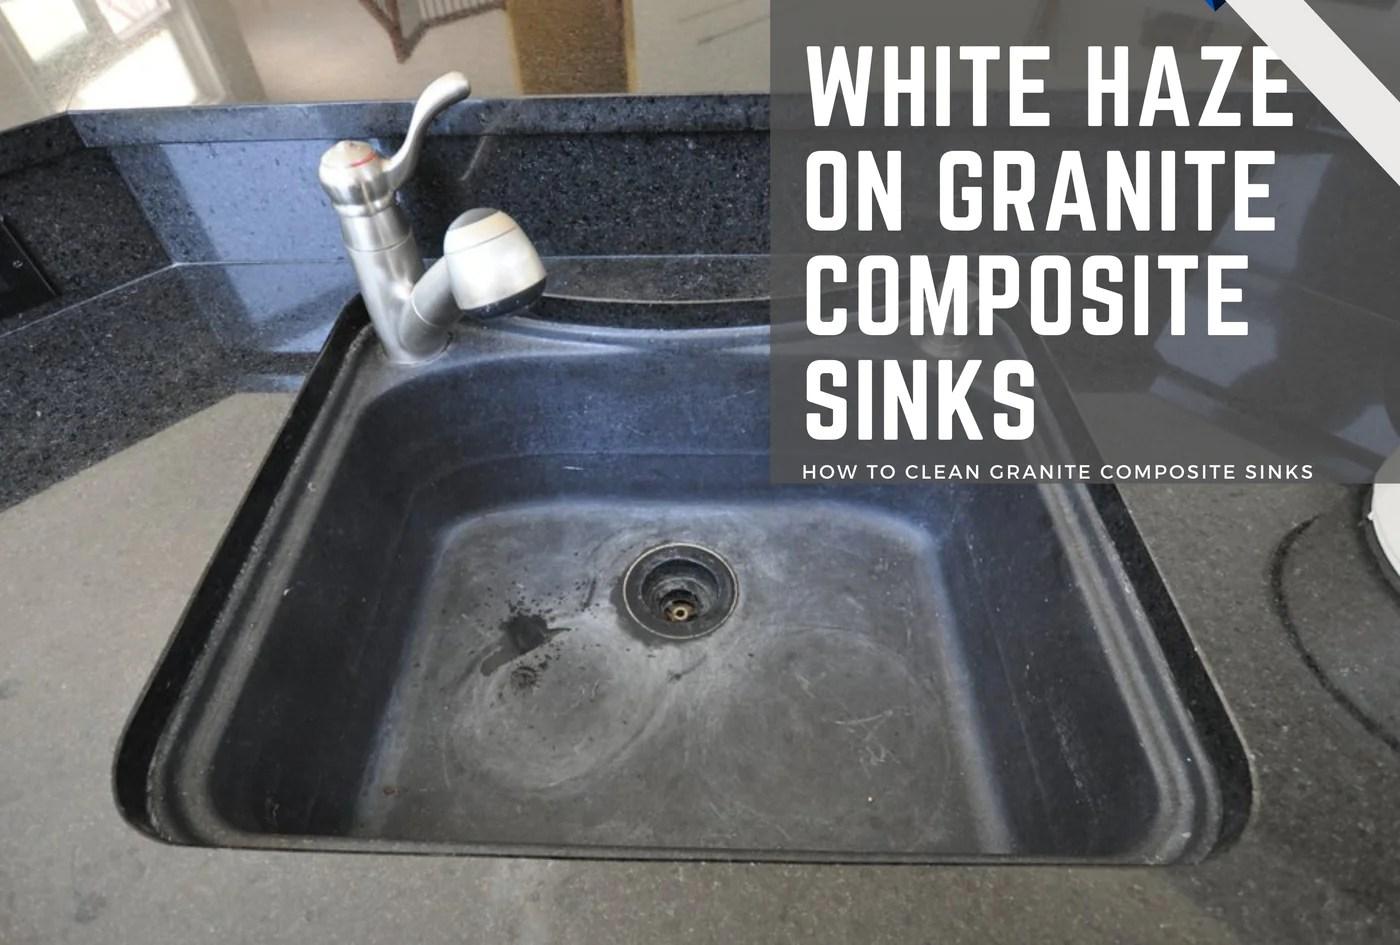 white haze on granite composite sinks